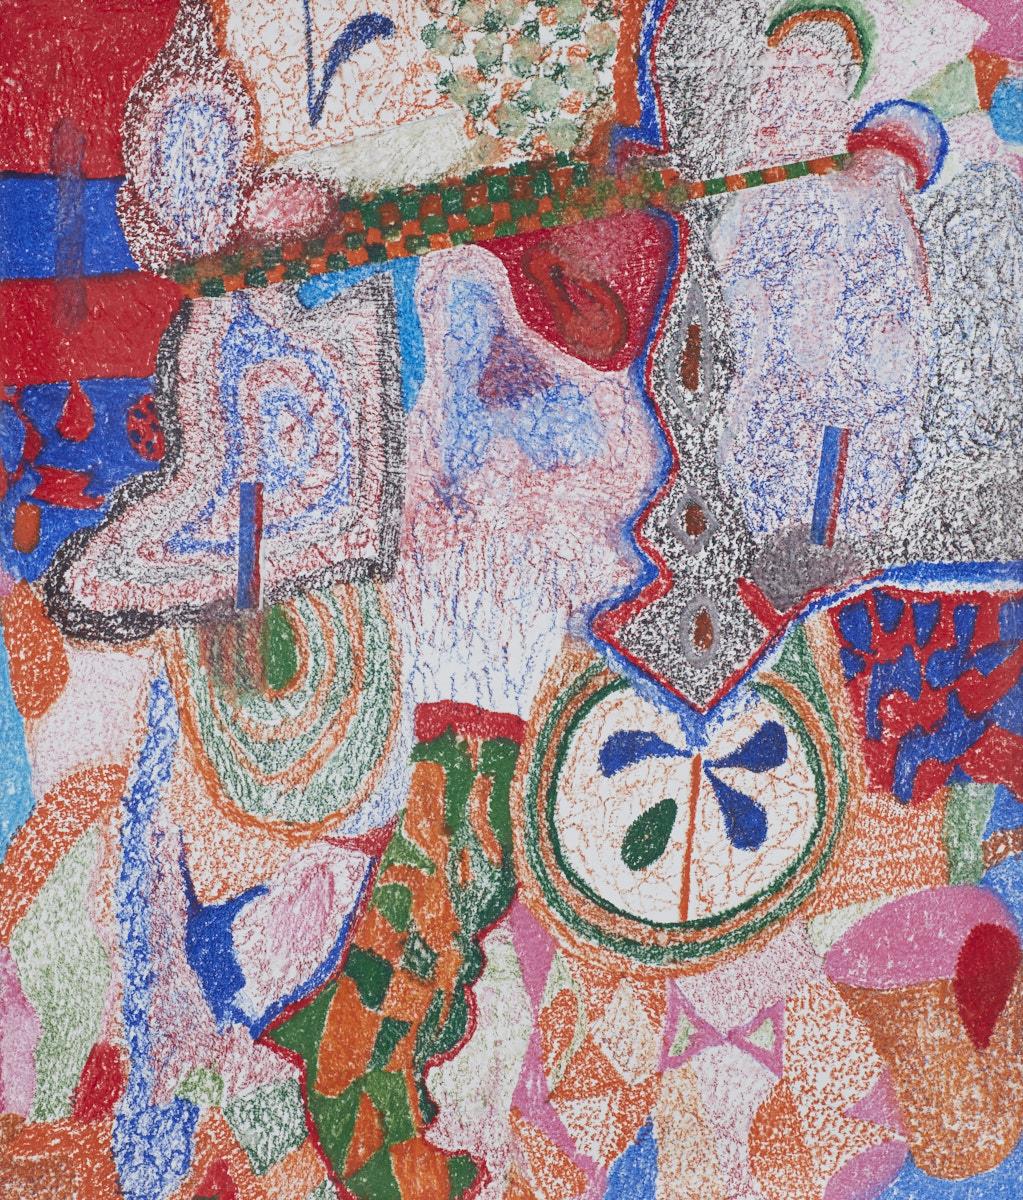 O.T. ( Mozambique Primal Scream IV ), 2018  Buntstift auf Papier, 150x180cm